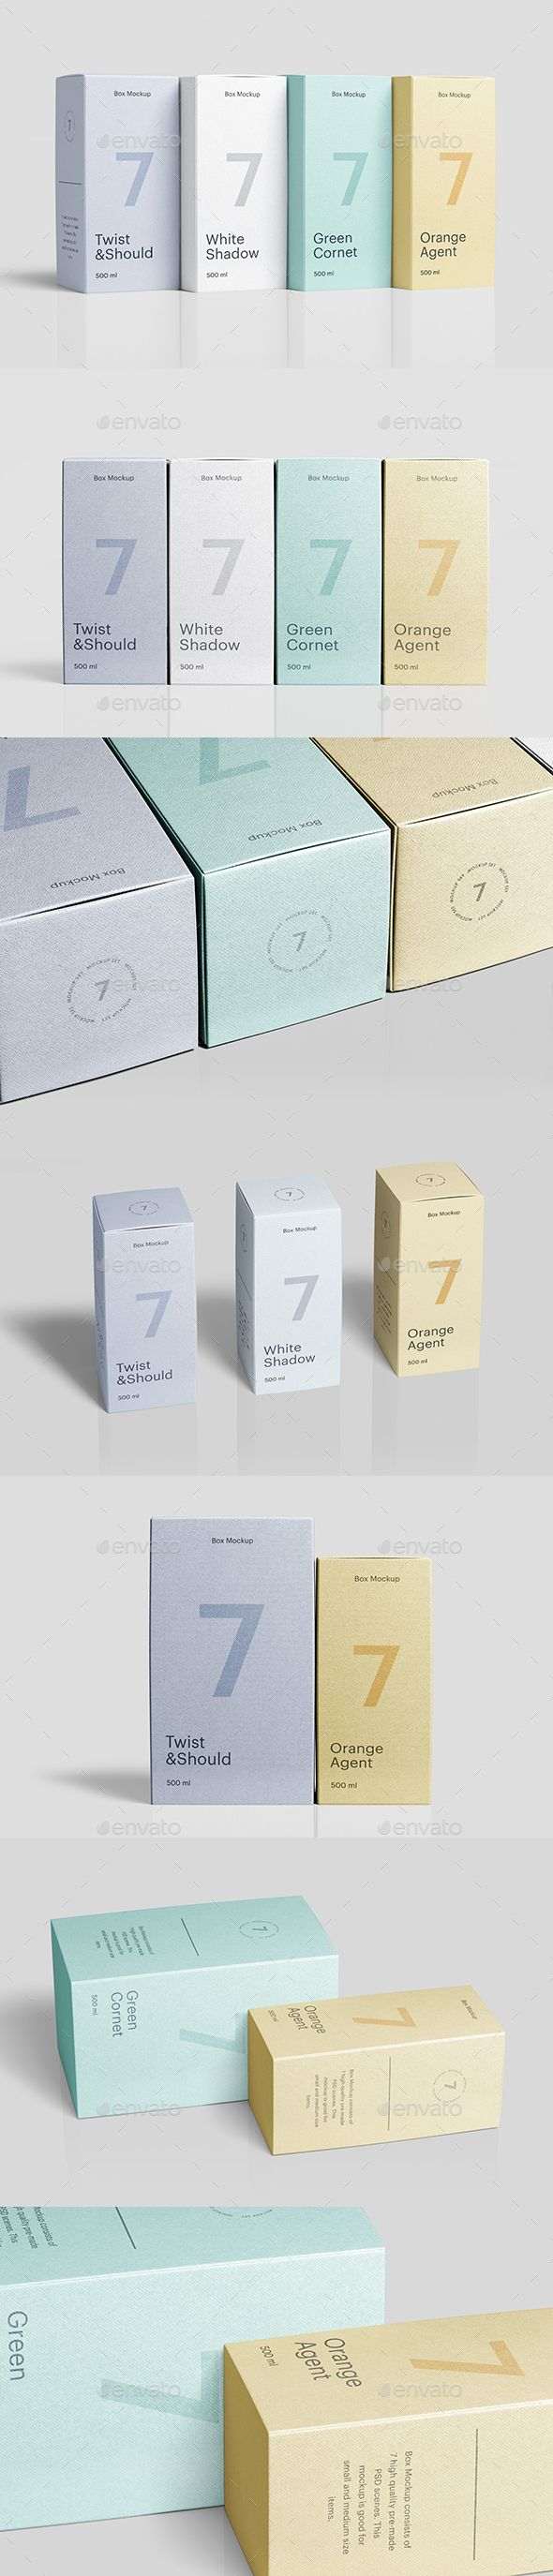 Download Box Mockup Box Mockup Graphic Design Templates Presentation Templates